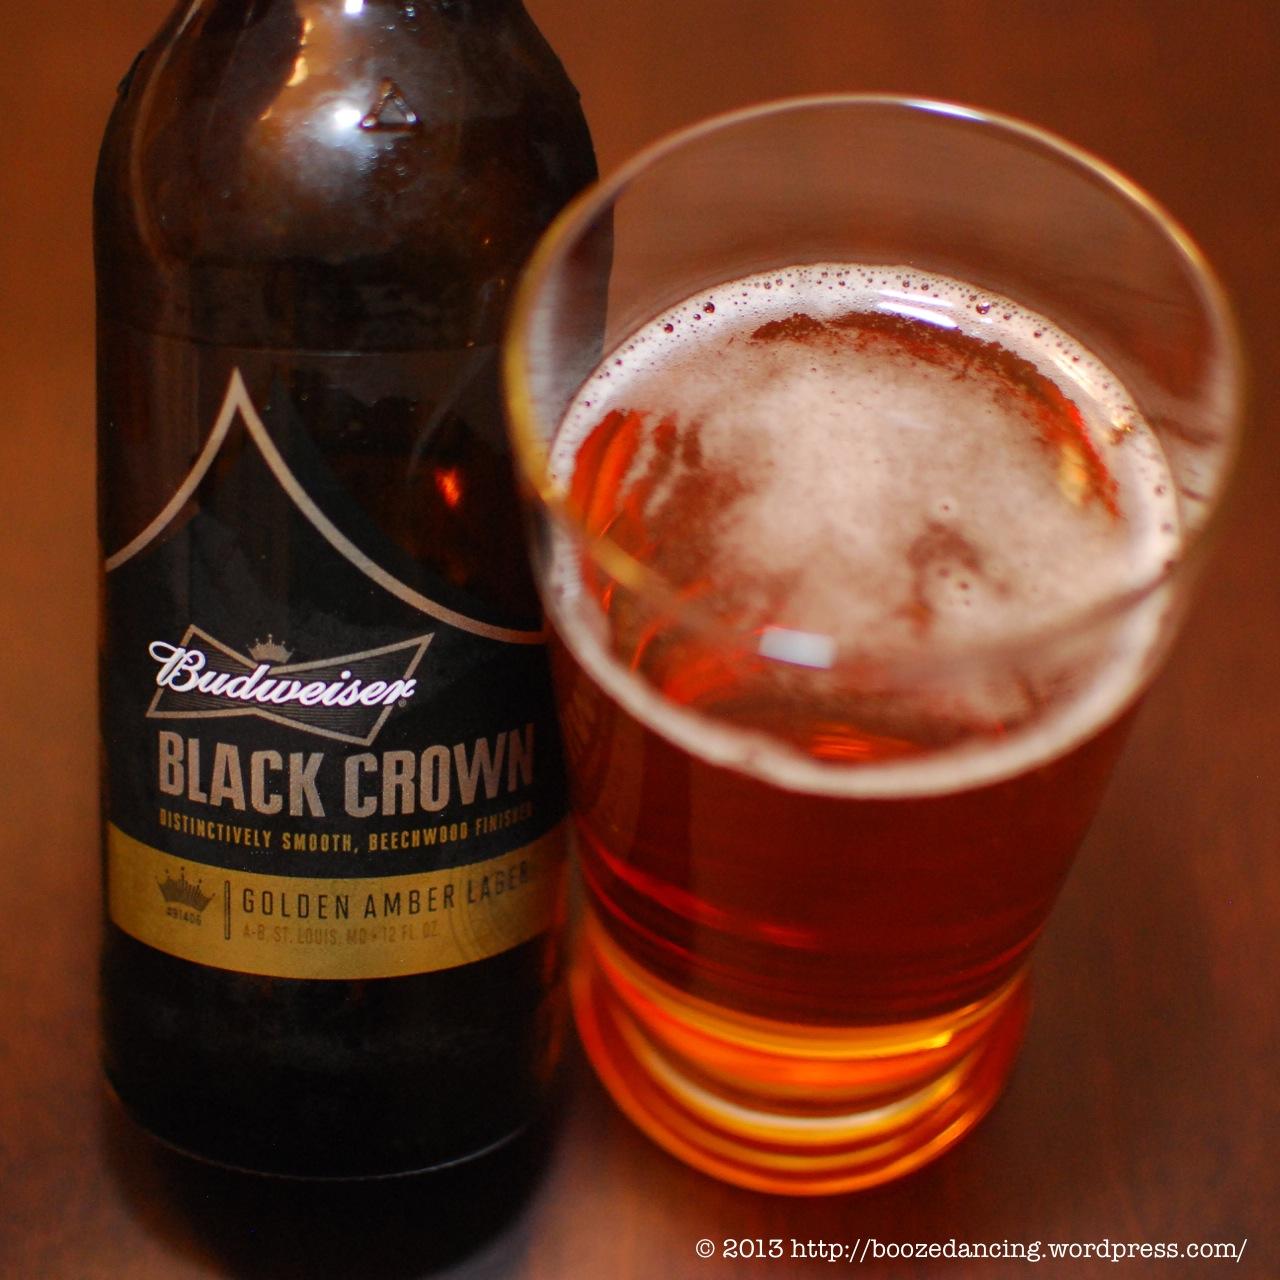 Budweiser Black Crown